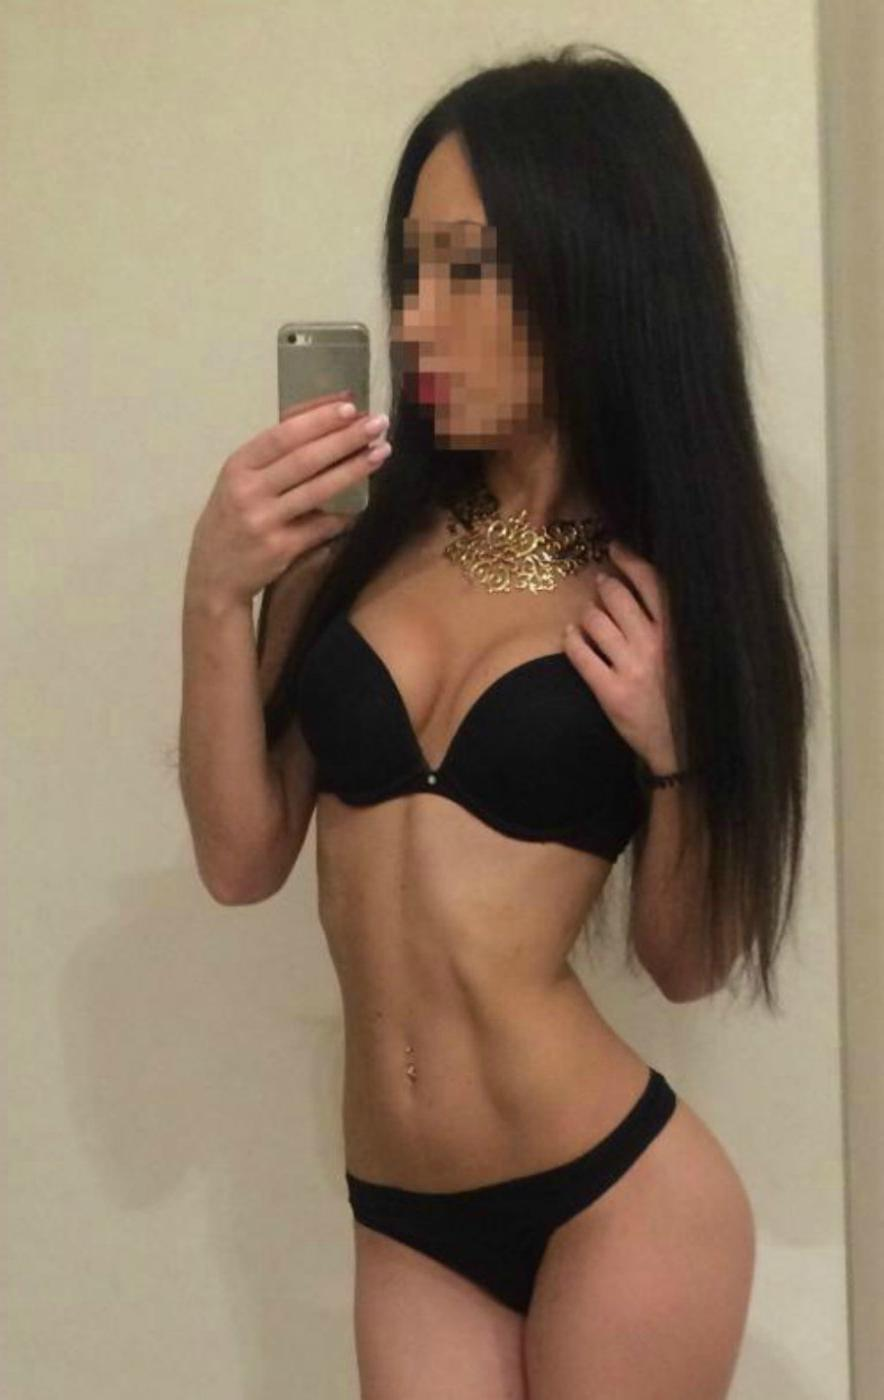 Путана Ангелина, 34 года, метро Косино